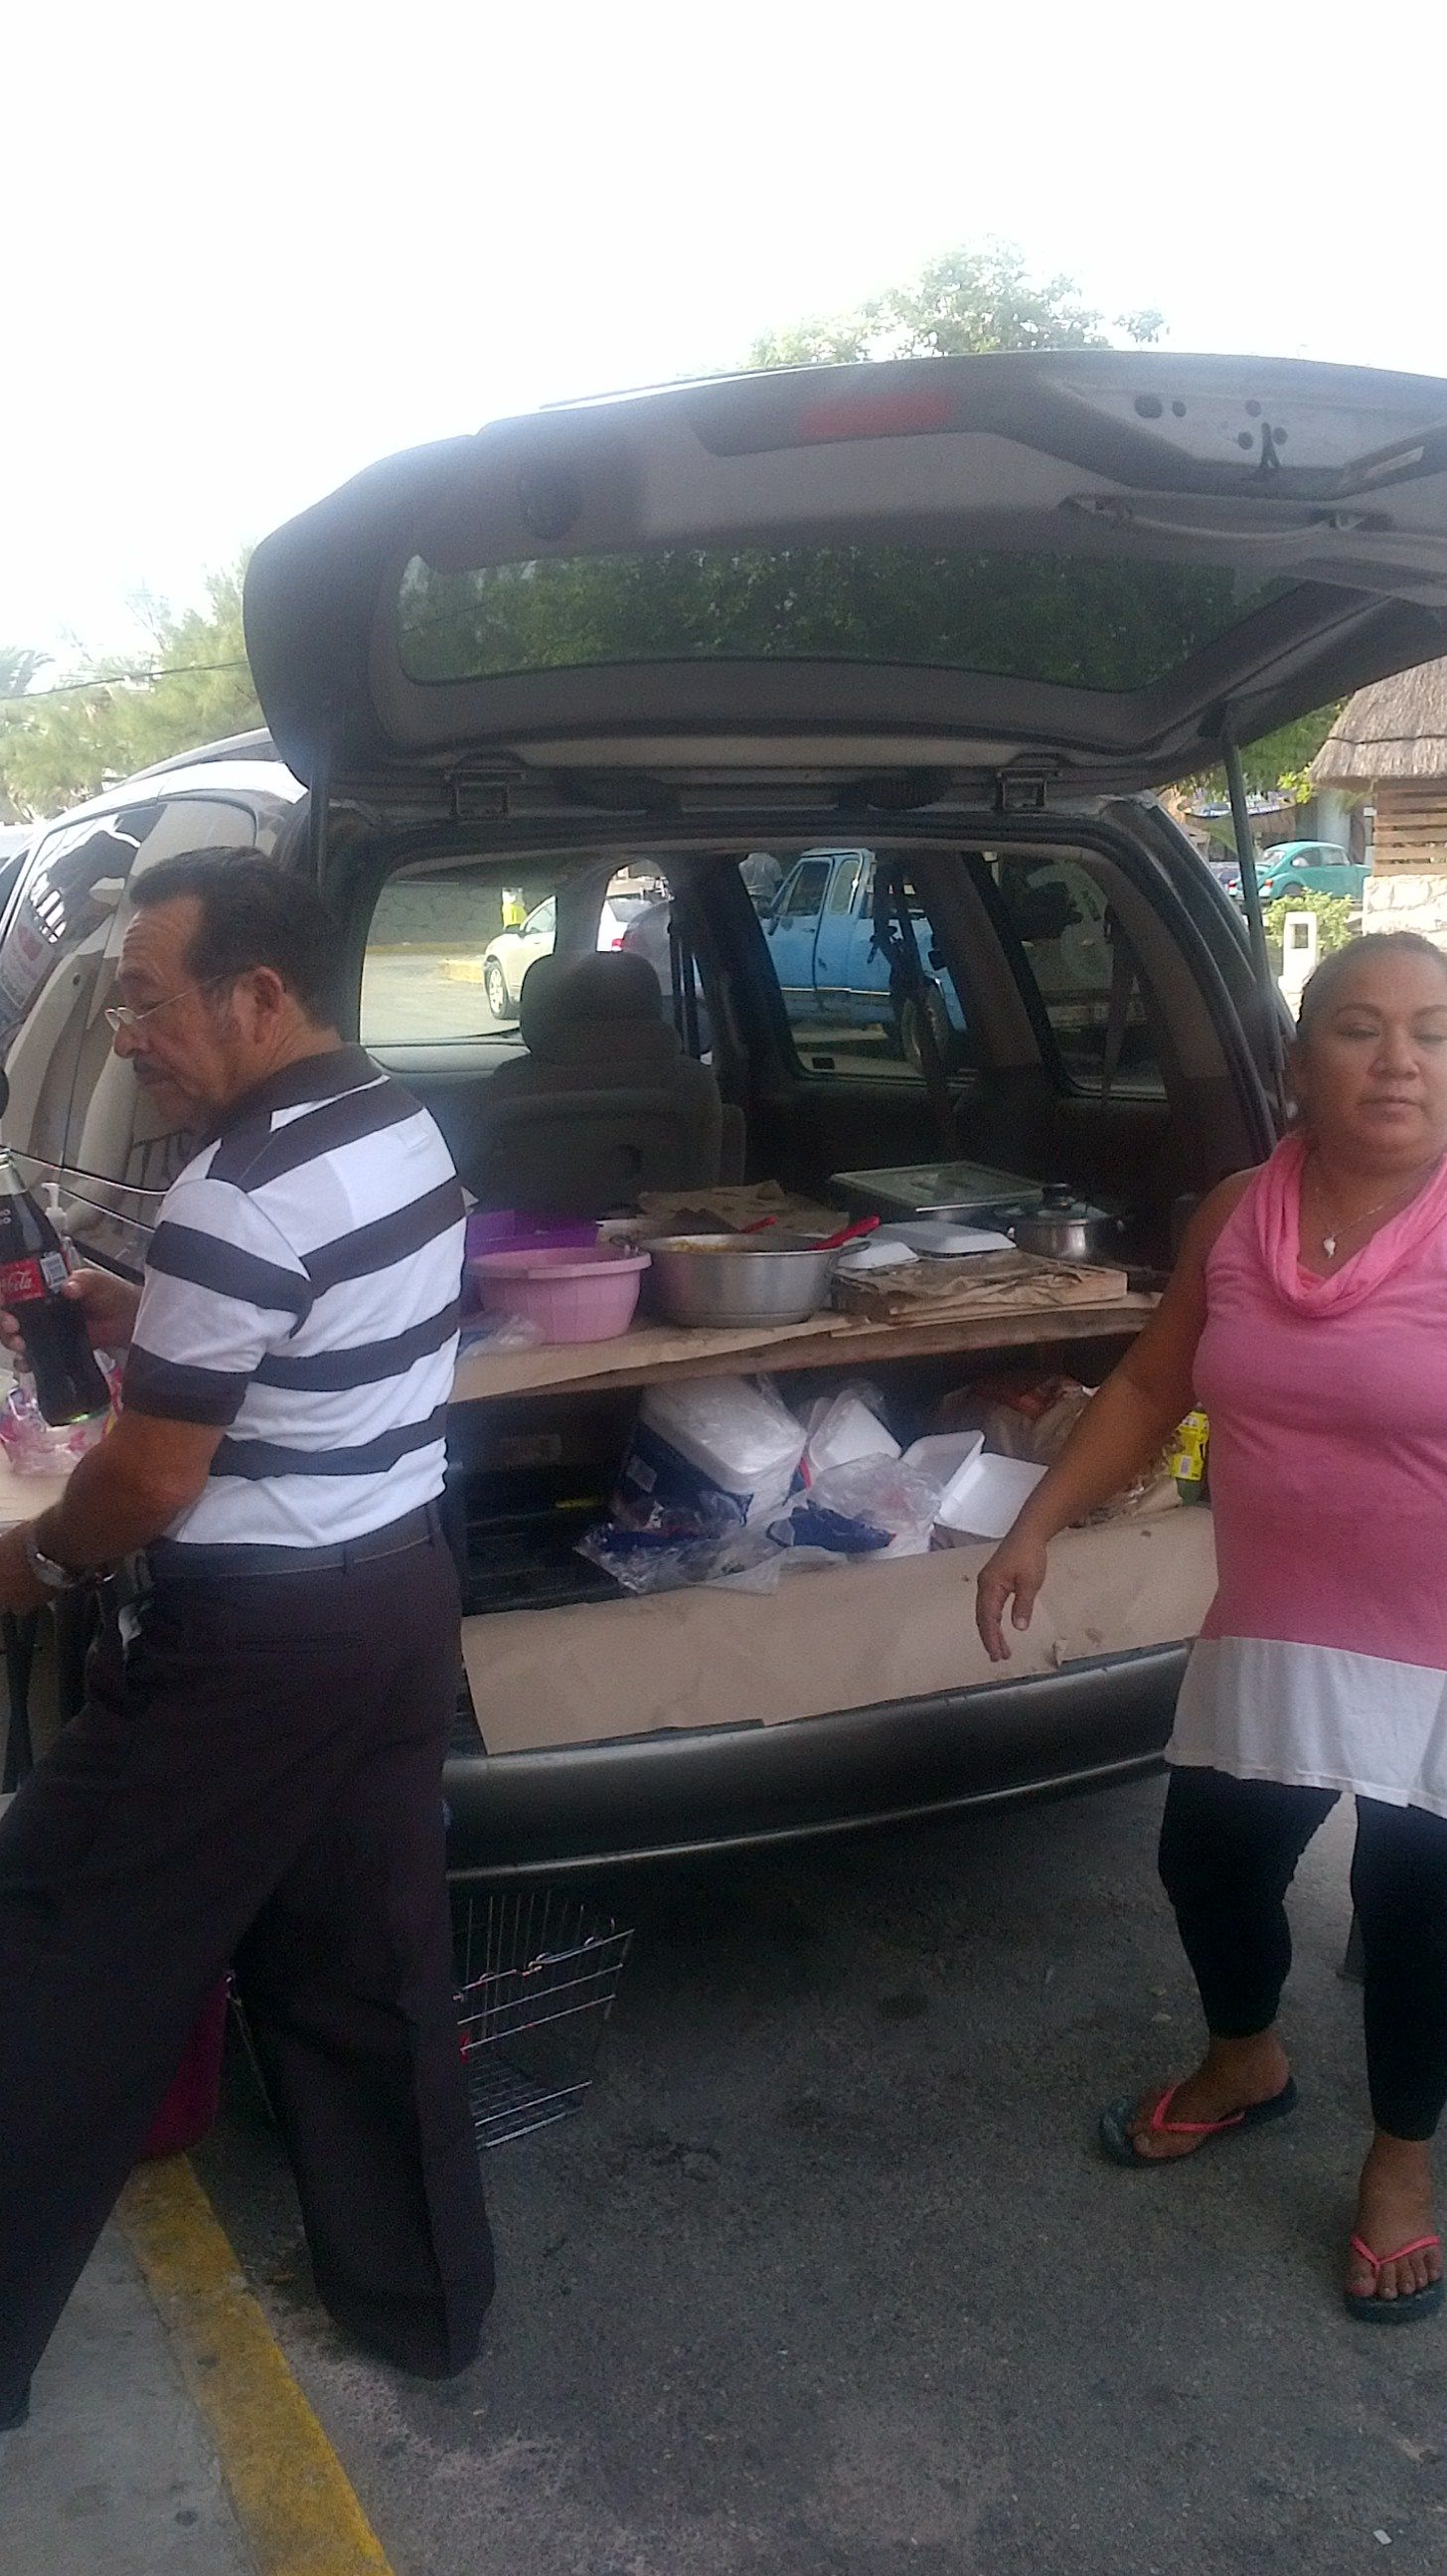 Fishermans breakfast out of back of van - Puerto Morelos town square